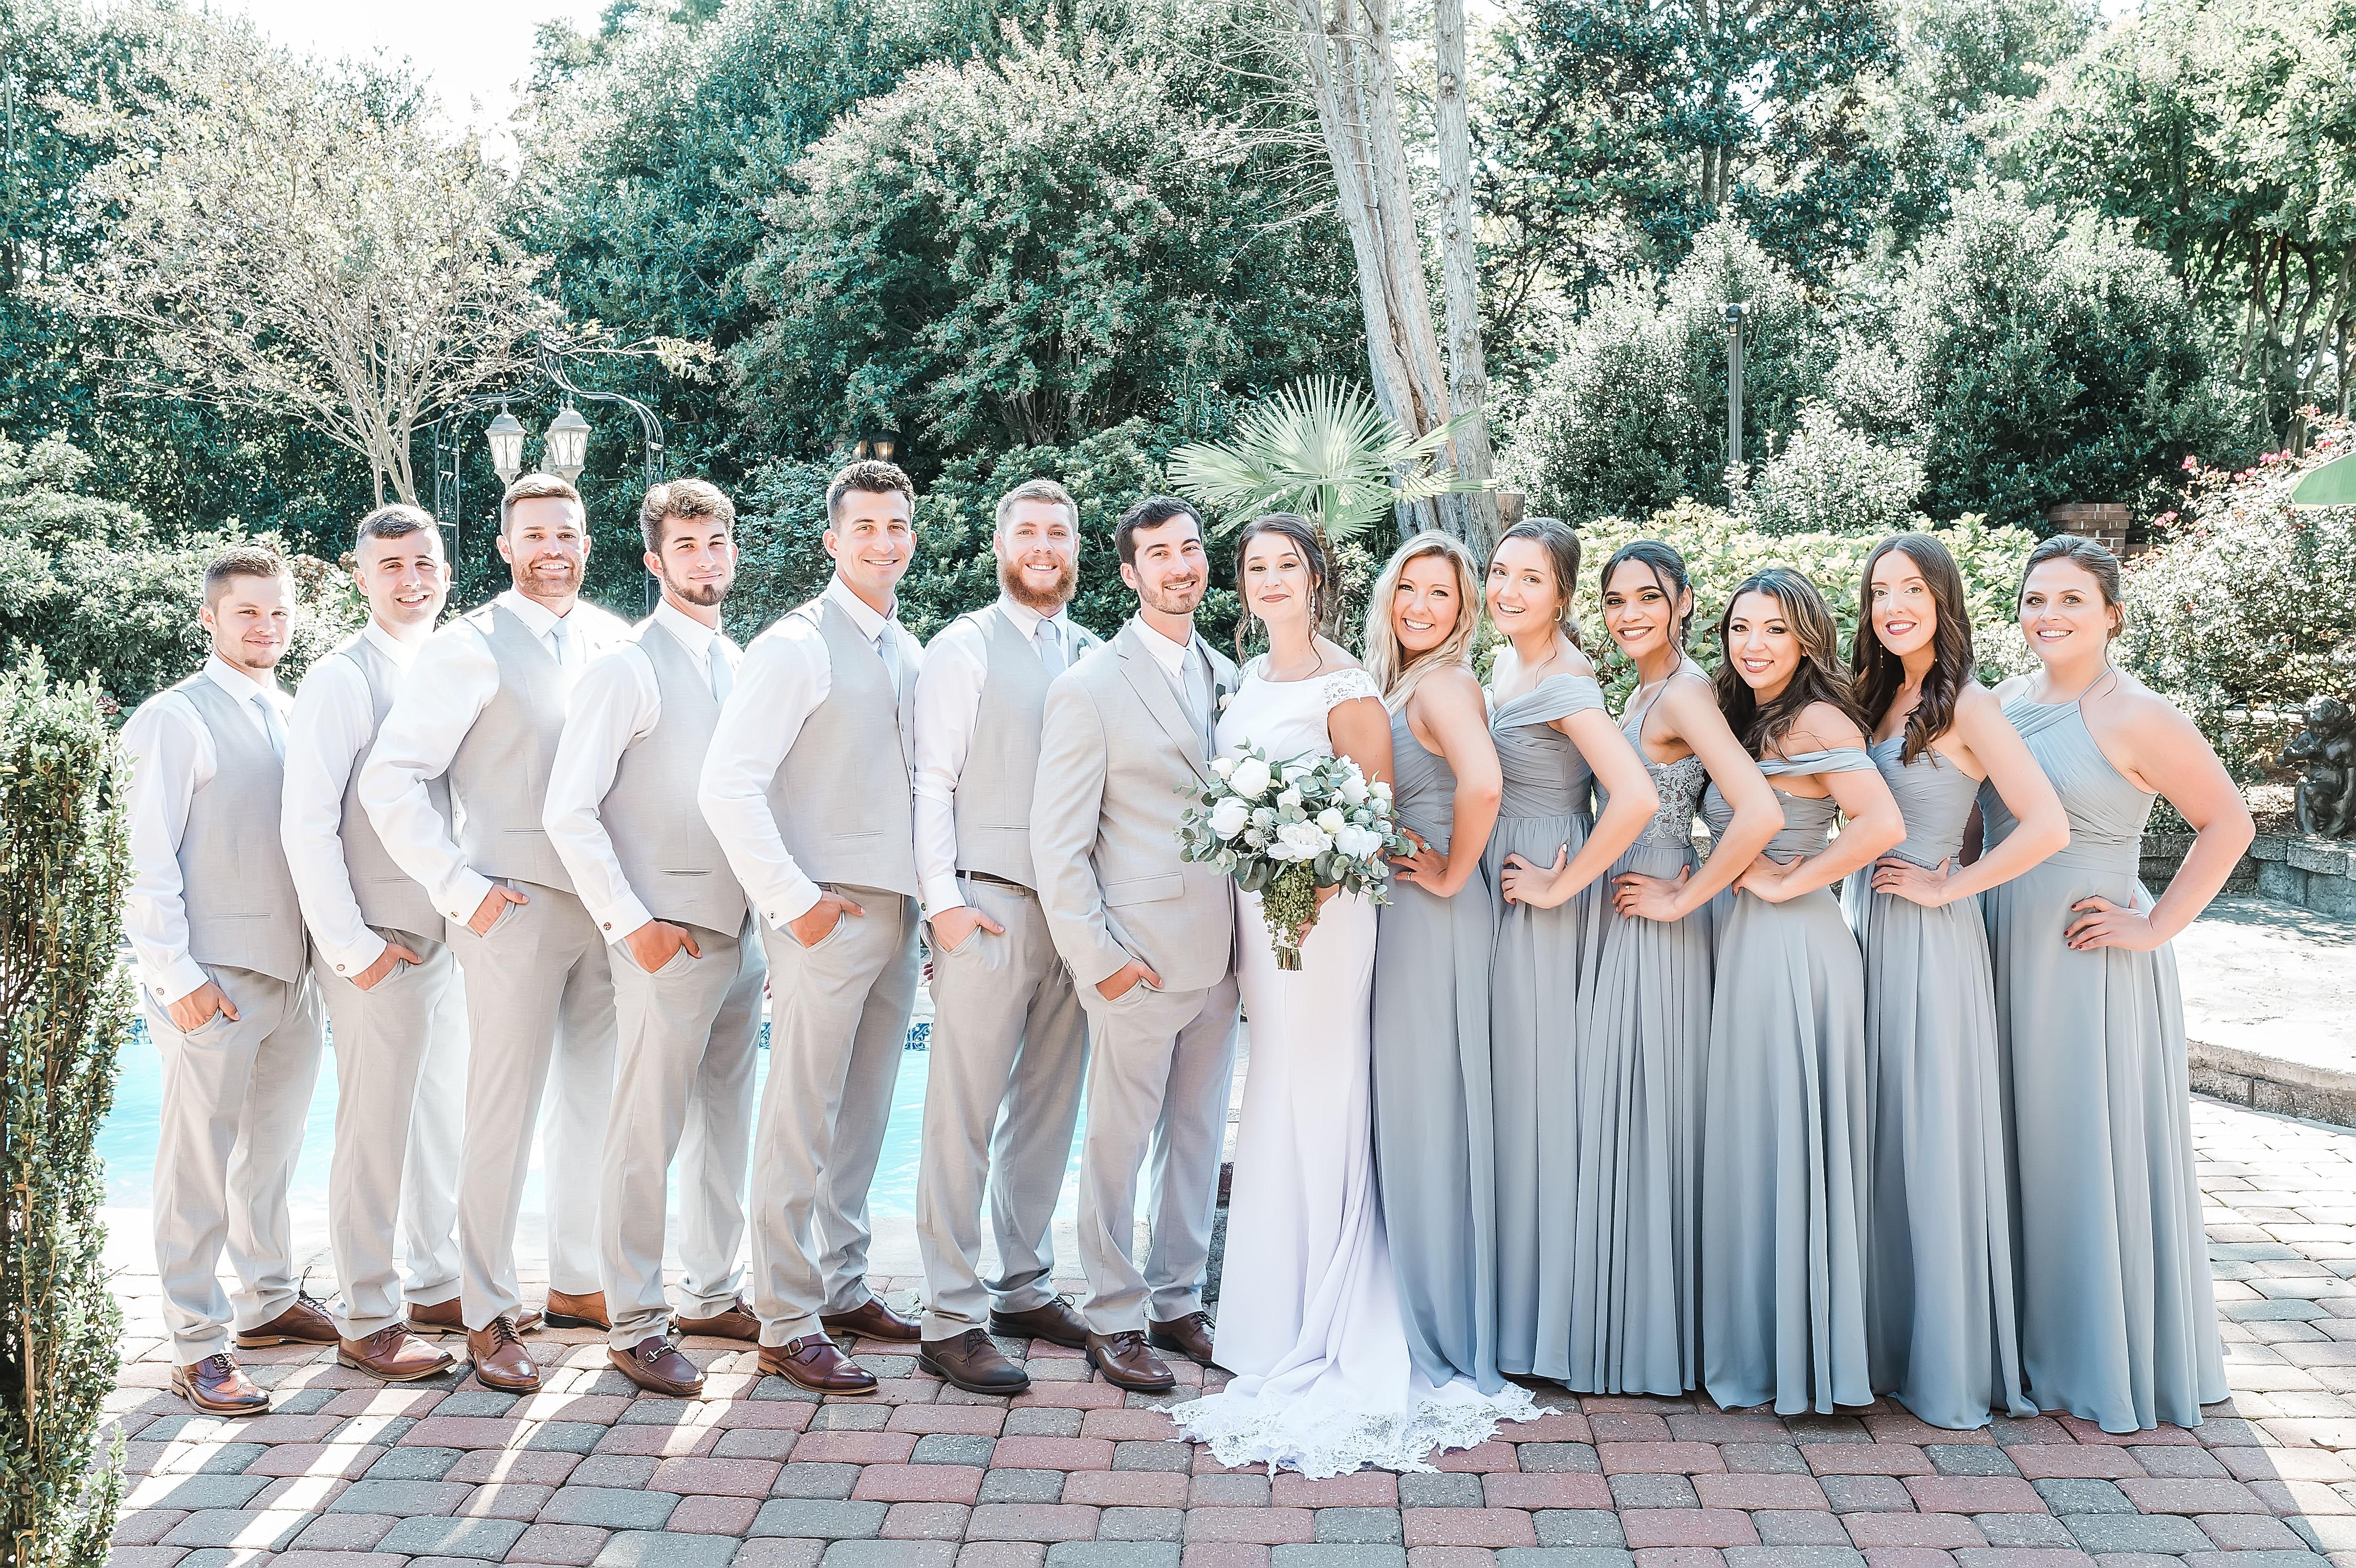 formal wedding party photos, dusty blue bridesmaids dresses, sandy groomsmen suits